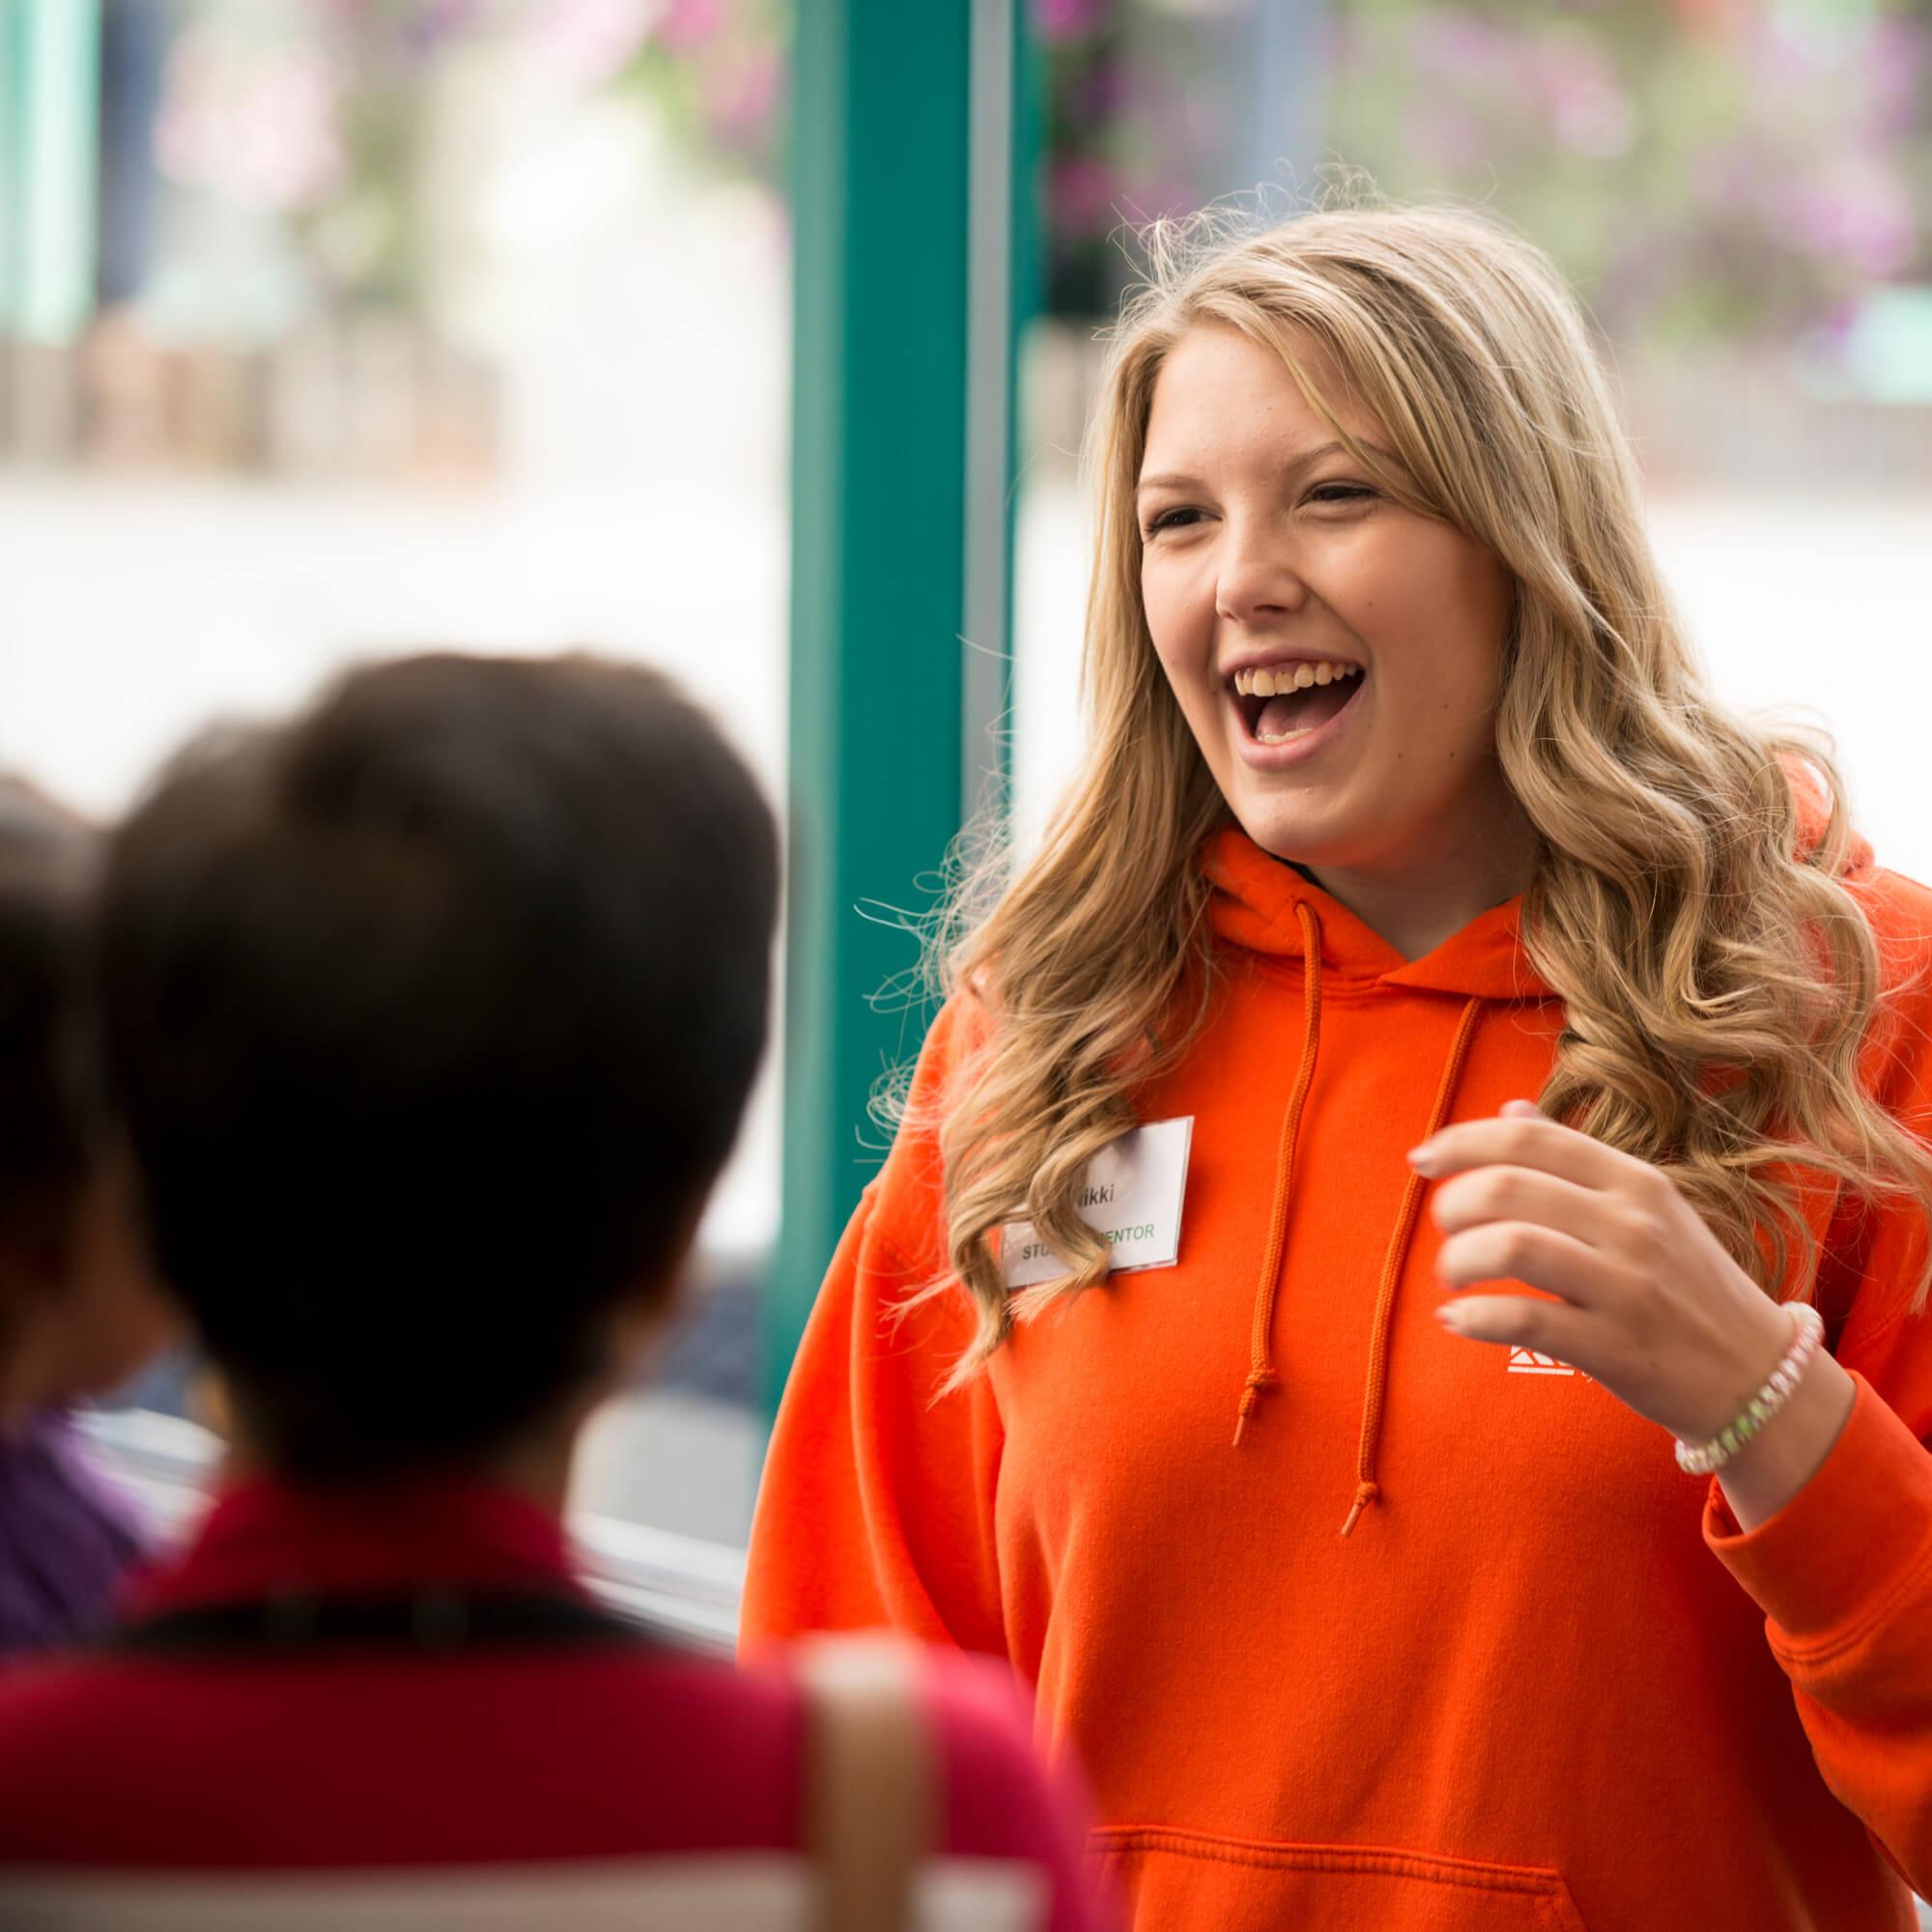 A student ambassador smiling and talking to visitors